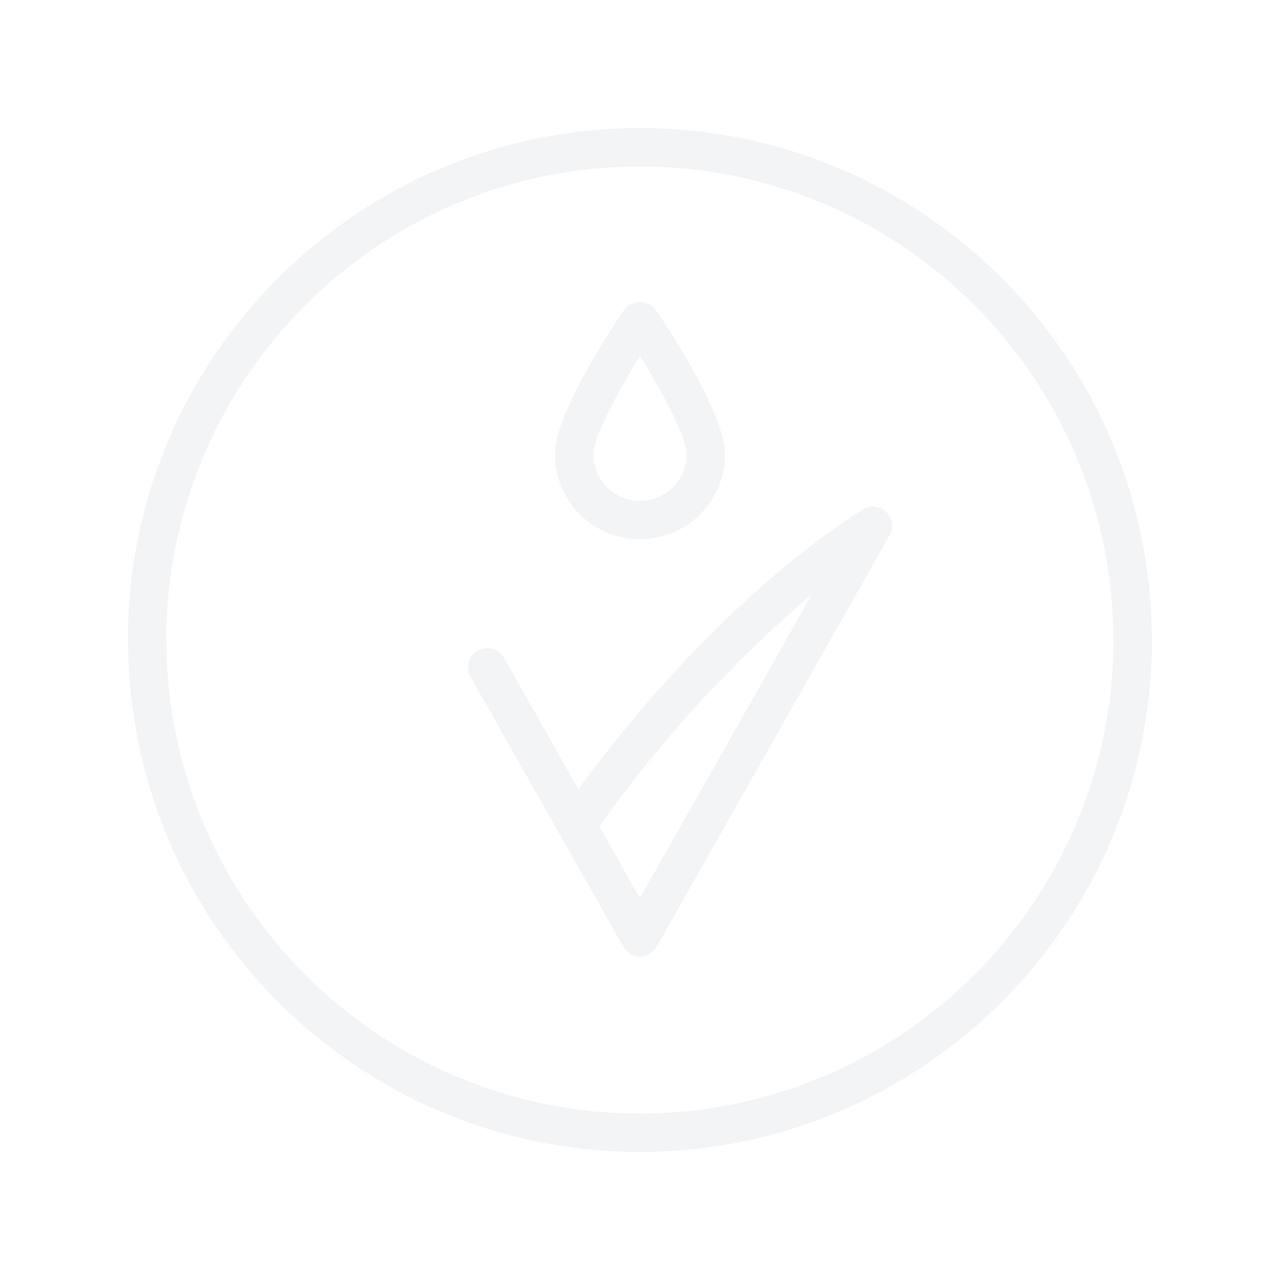 DOLCE & GABBANA The One 30ml Eau De Parfum Gift Set